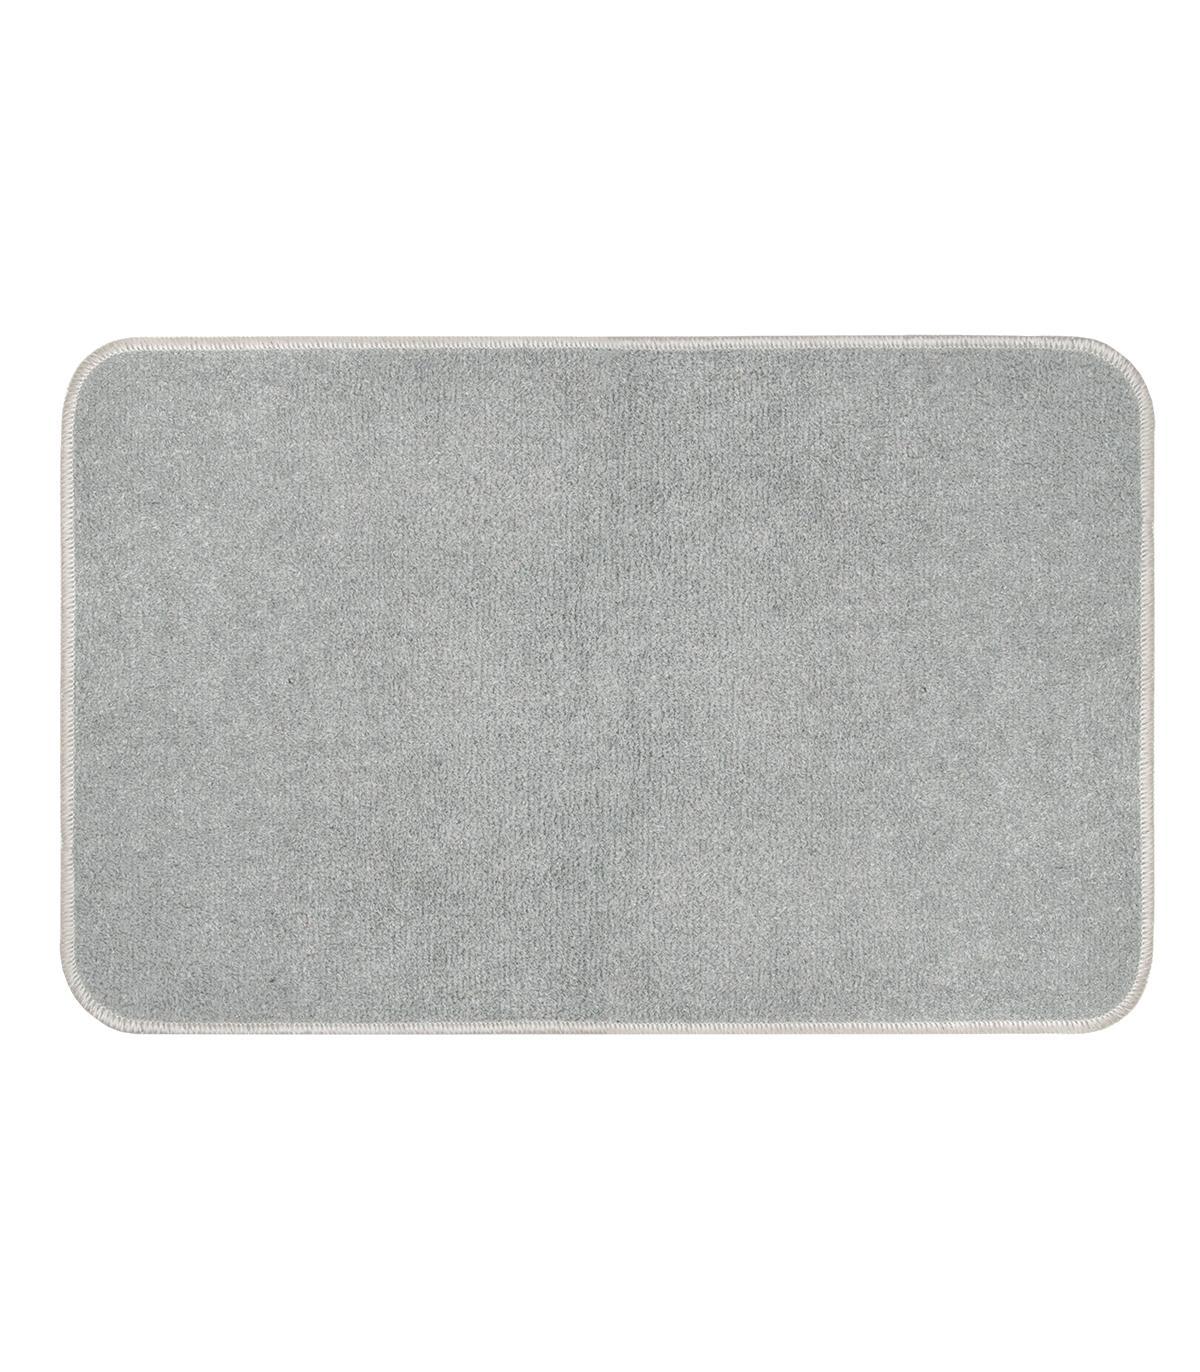 Duravit pannello laterale dx vasca da 70 cm d code 701031 bianco - Vasca da bagno duravit ...